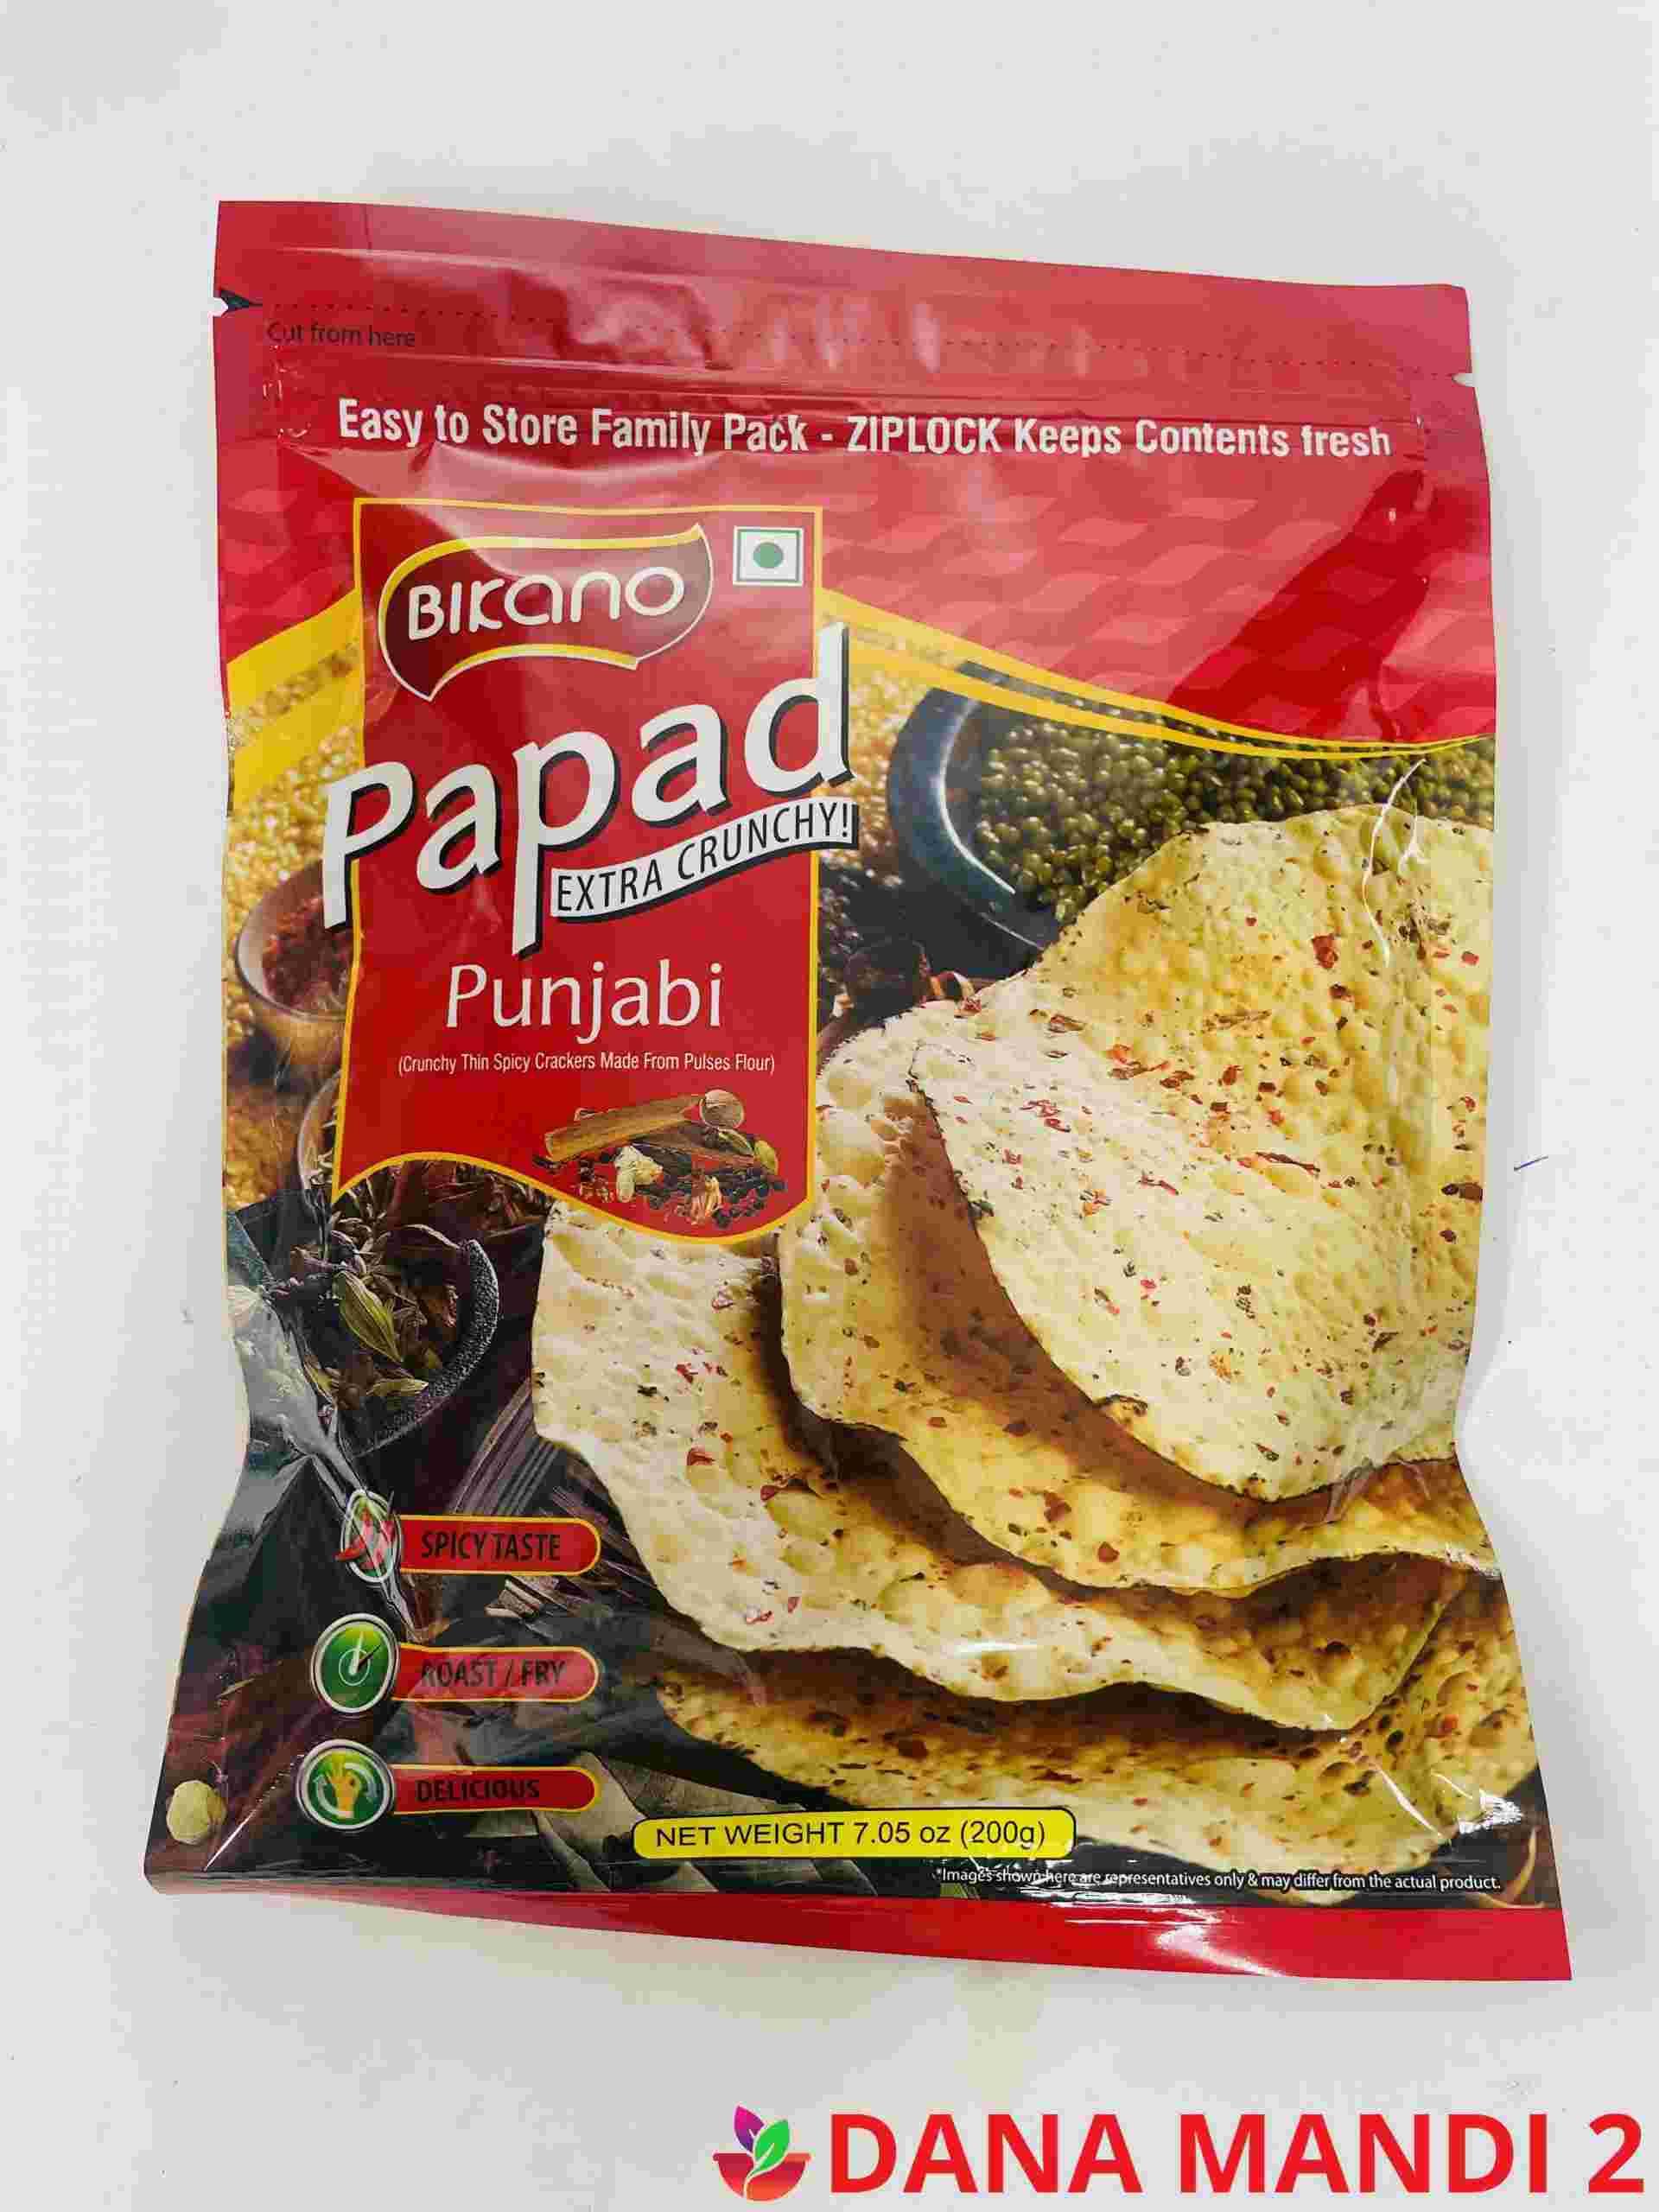 BIKANO Punjabi Papad